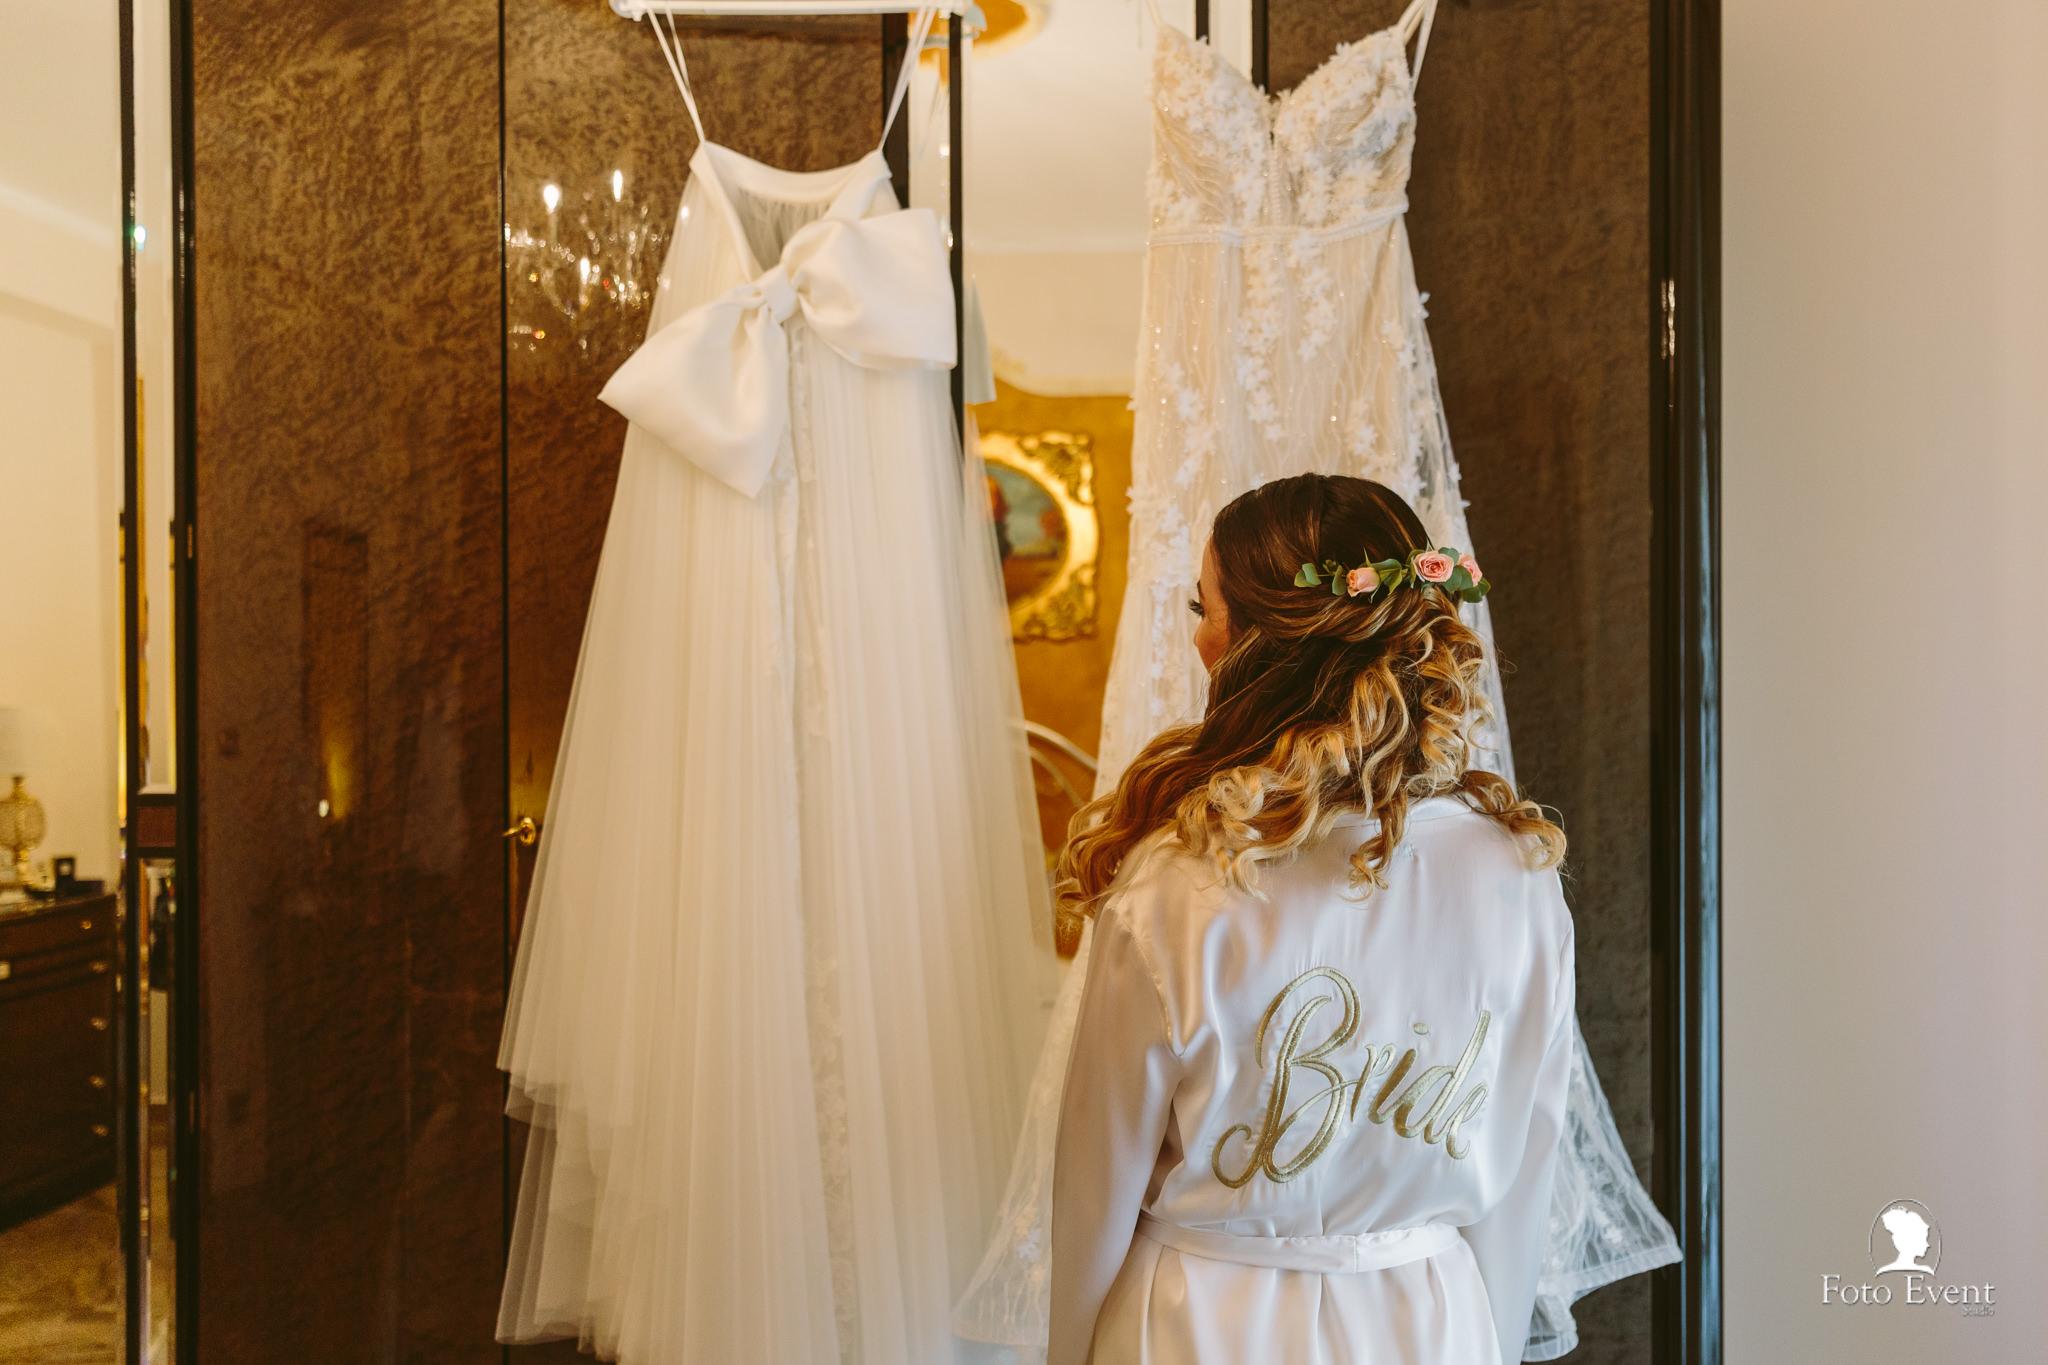 016-2019-08-22-Matrimonio-Angela-e-Nicola-Iaconis-401